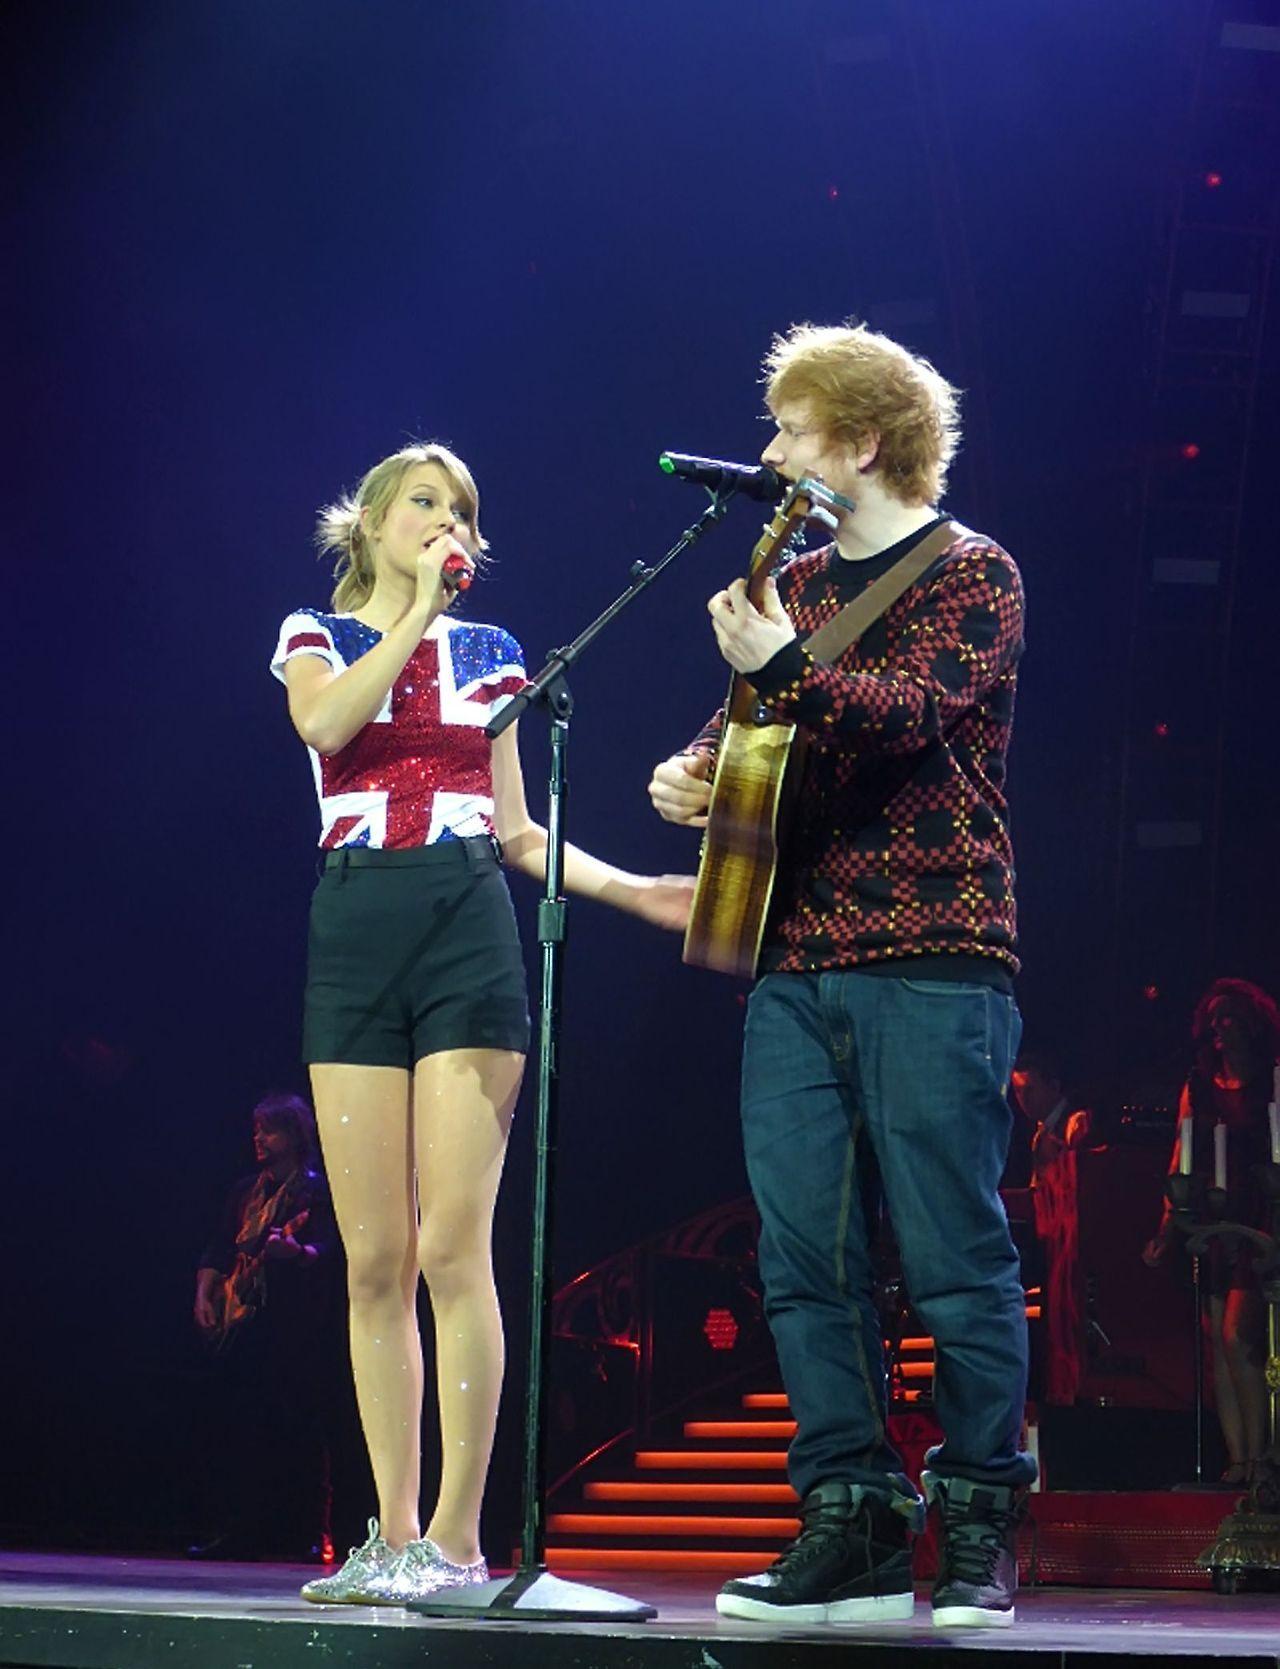 Lego House W Ed Sheeran Red Tour London 2 1 14 Taylor Swift